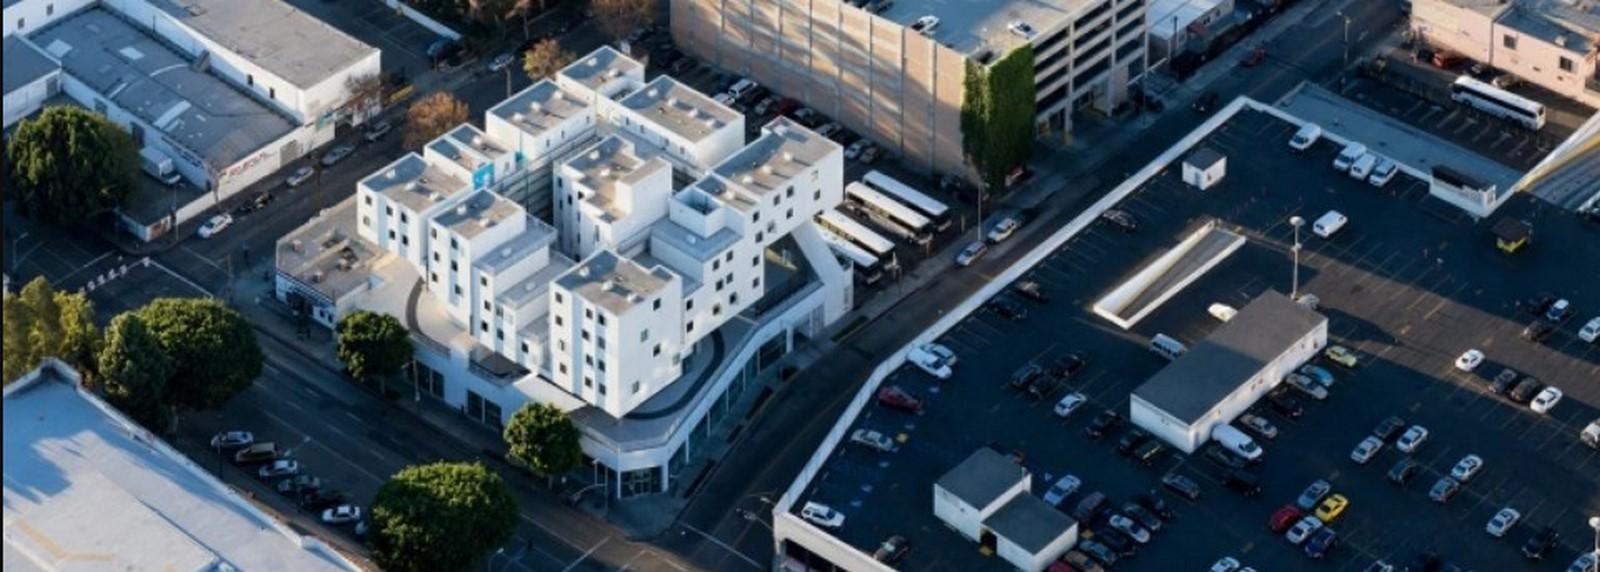 Star Apartments by Michael Maltzan - Sheet2